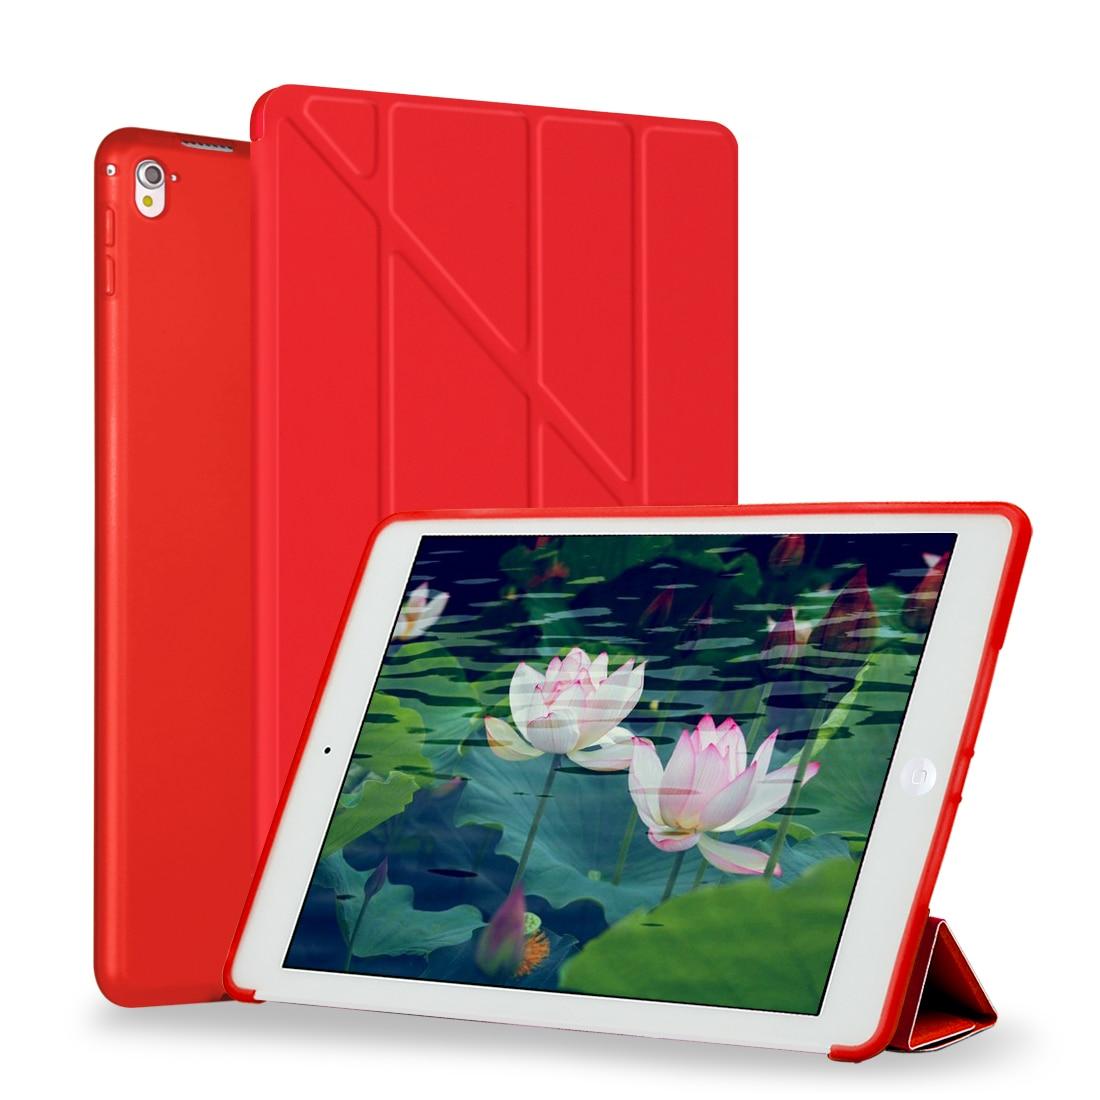 Case For Ipad Mini 4 / Mini 3 2 1 Case PU Leather Transformers Smart Cover For Ipad Mini 4 With Silicone Soft Back Auto Wake Up